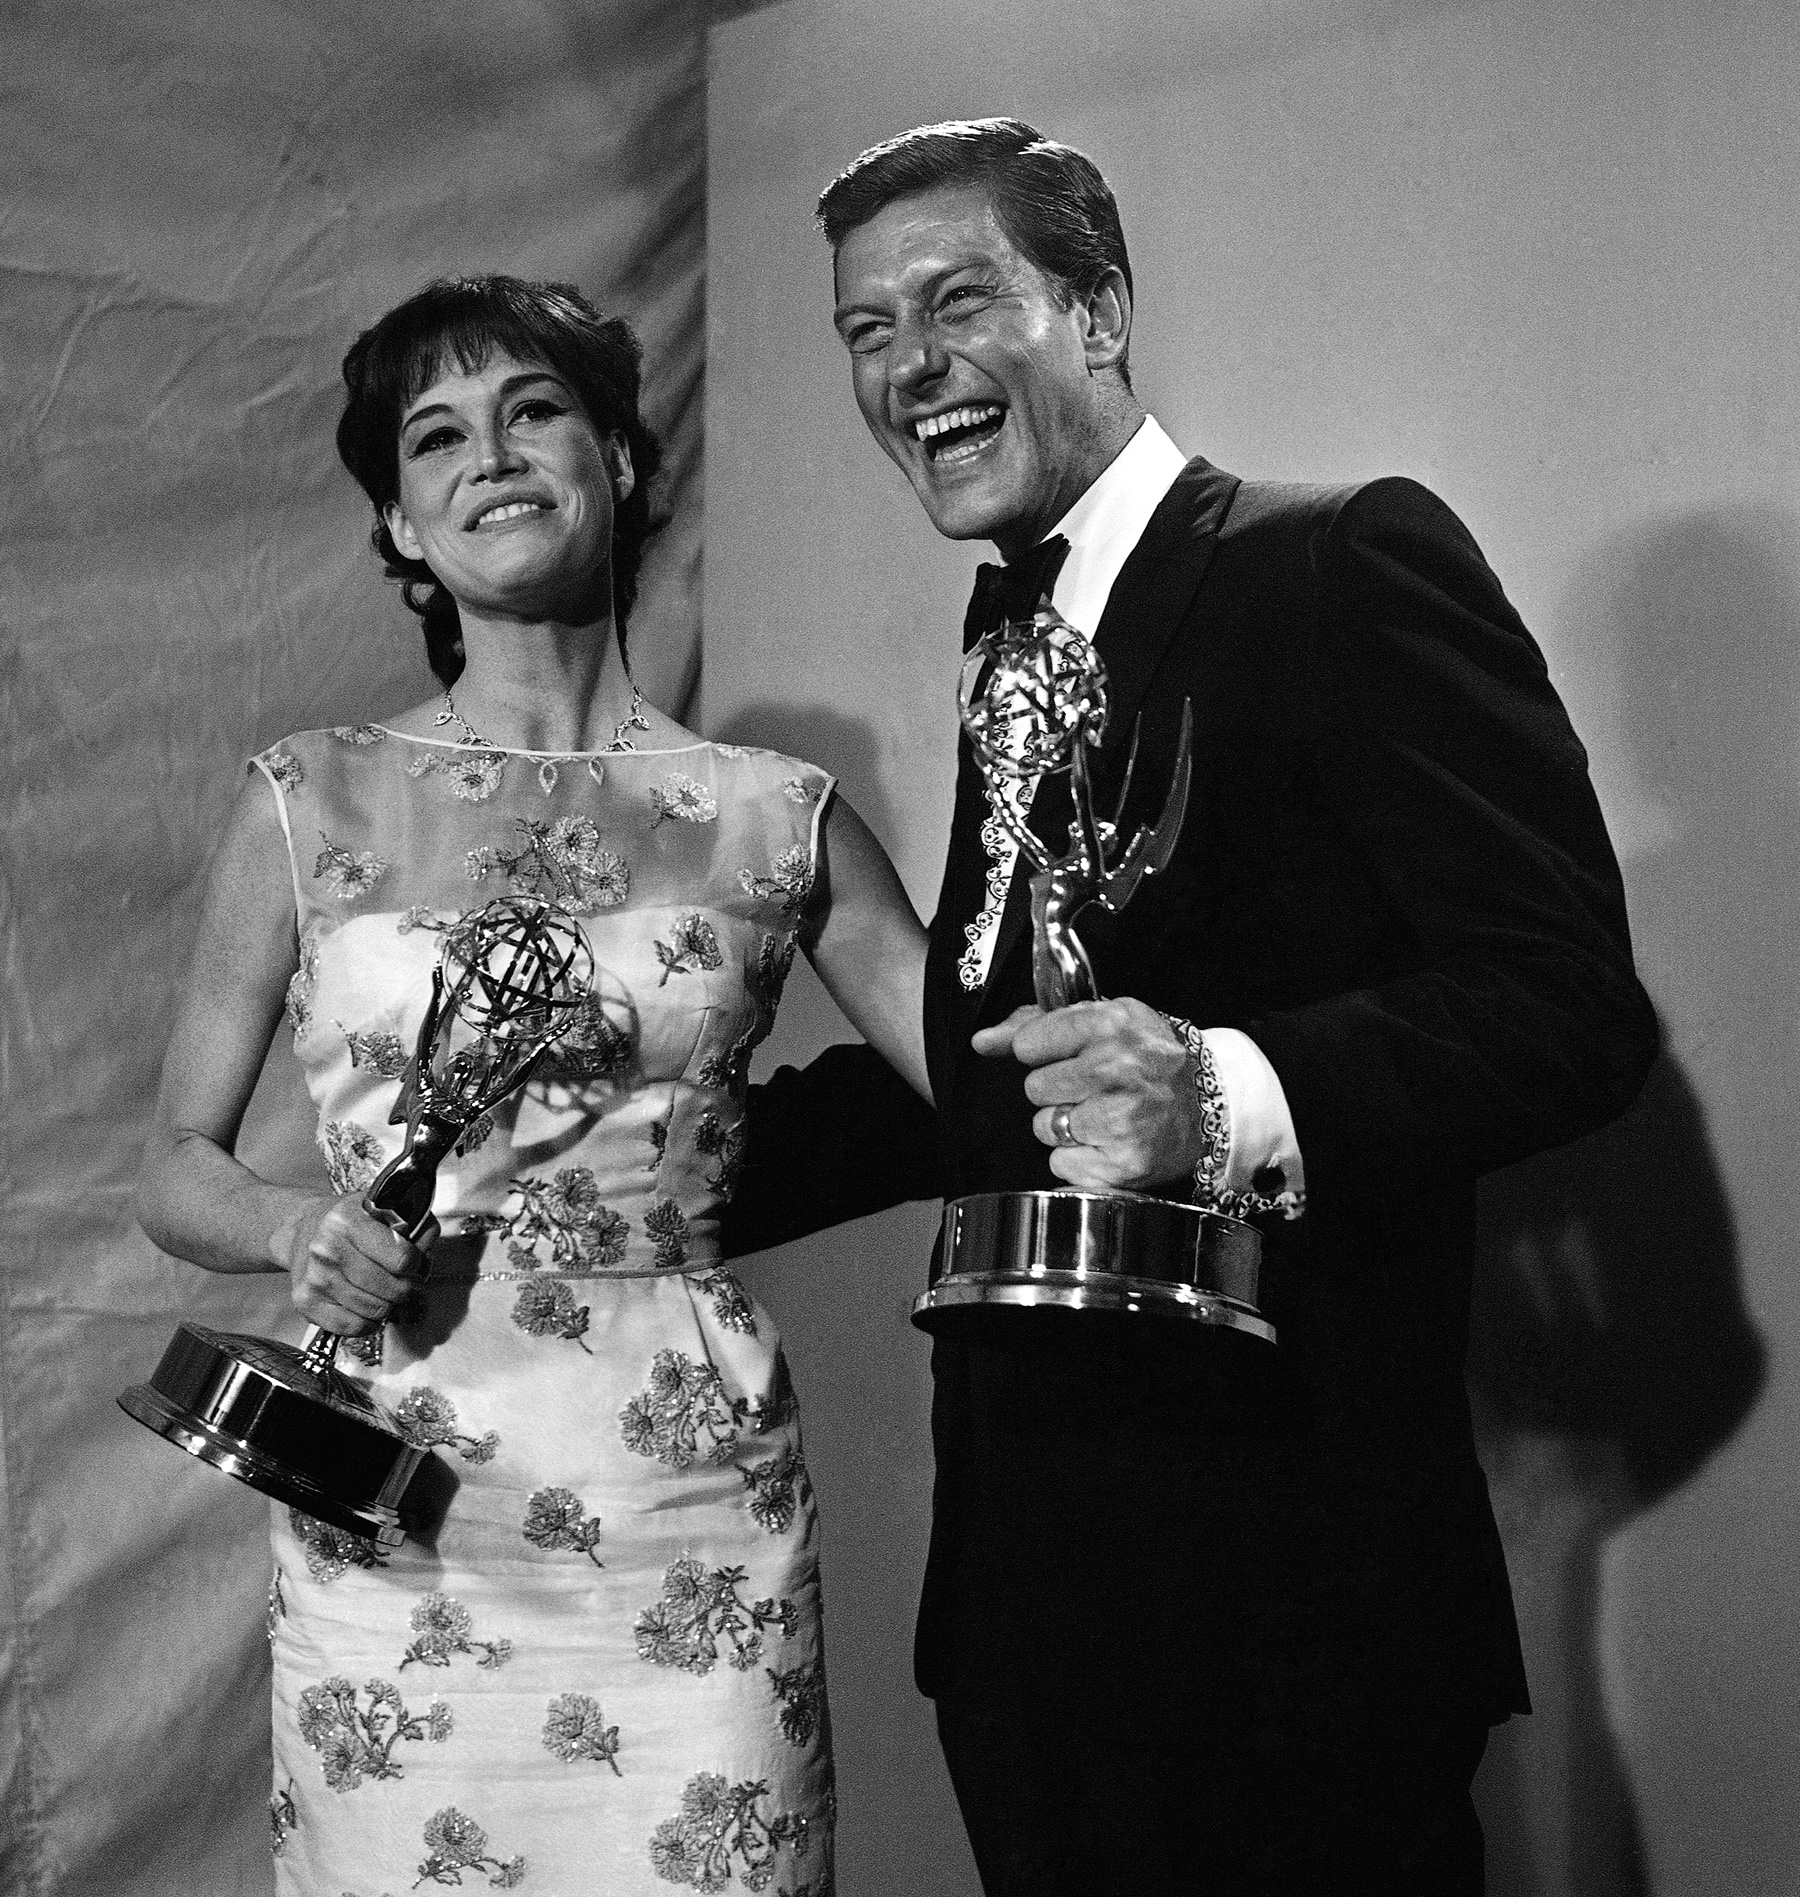 Dick Van Dyke and Mary Tyler Moore 1966